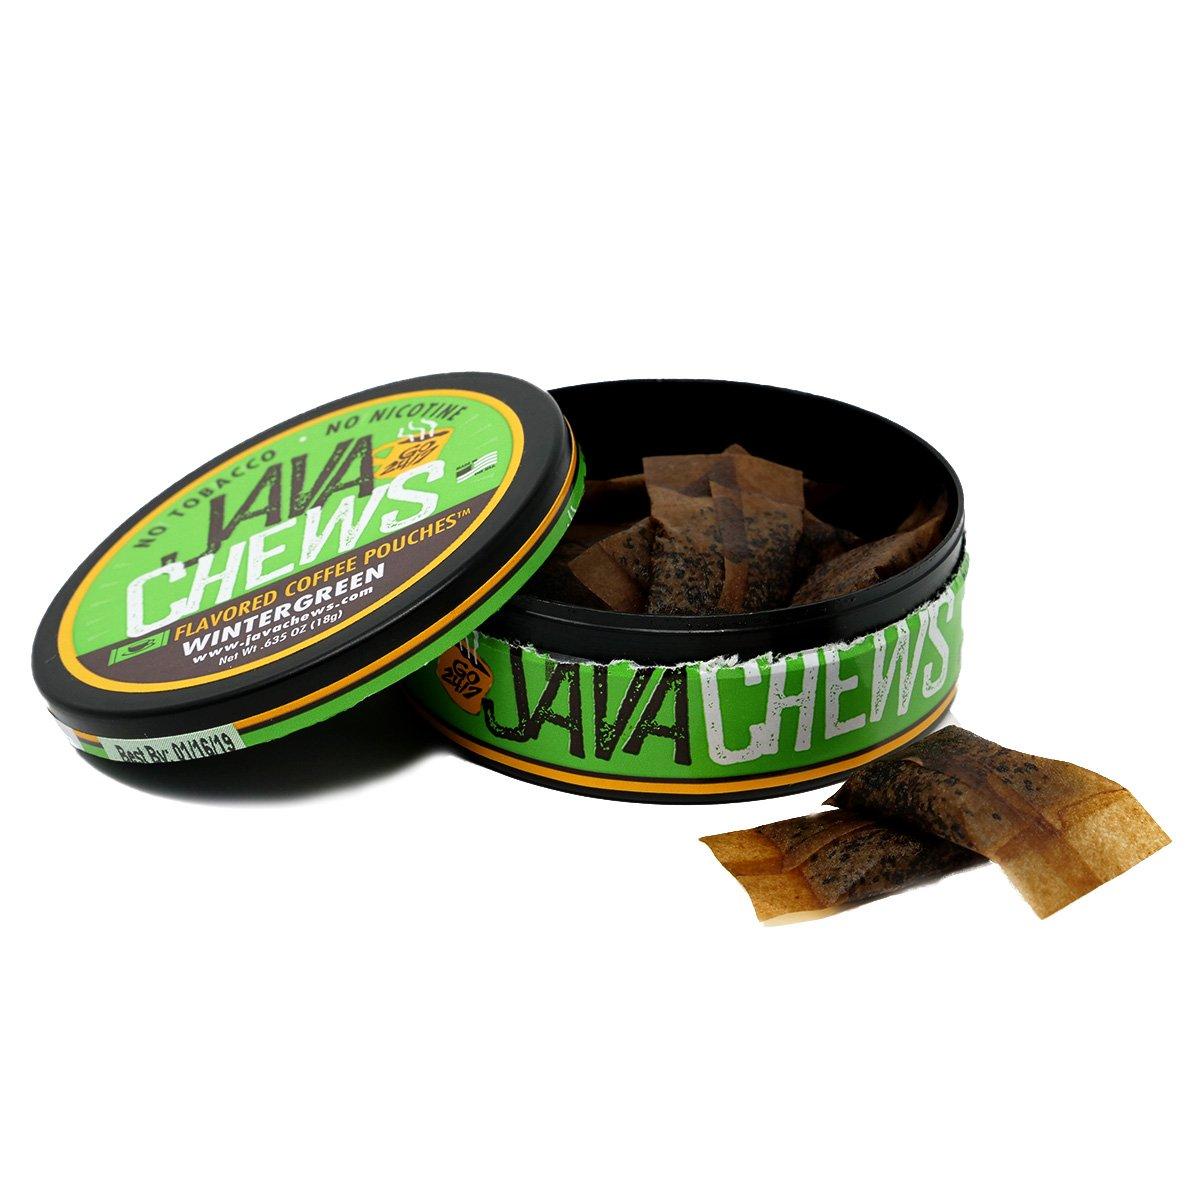 Java Chews, Premium Flavored Coffee Pouches, No Tobacco, No Nicotine Smokeless Alternative, Wintergreen (10 Cans)